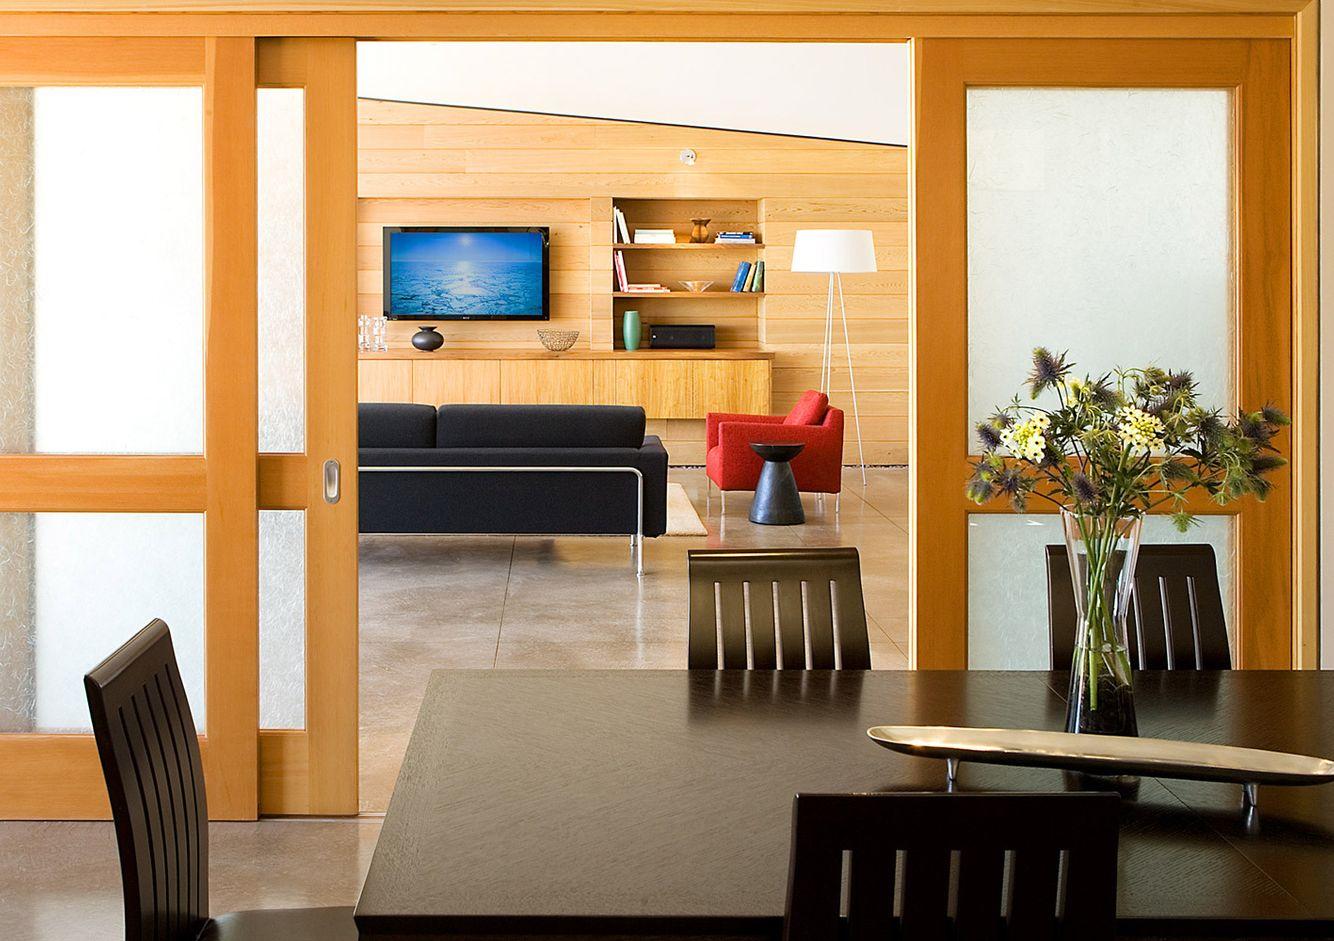 John-Sutton-Photography-Dining Room to Livingroom